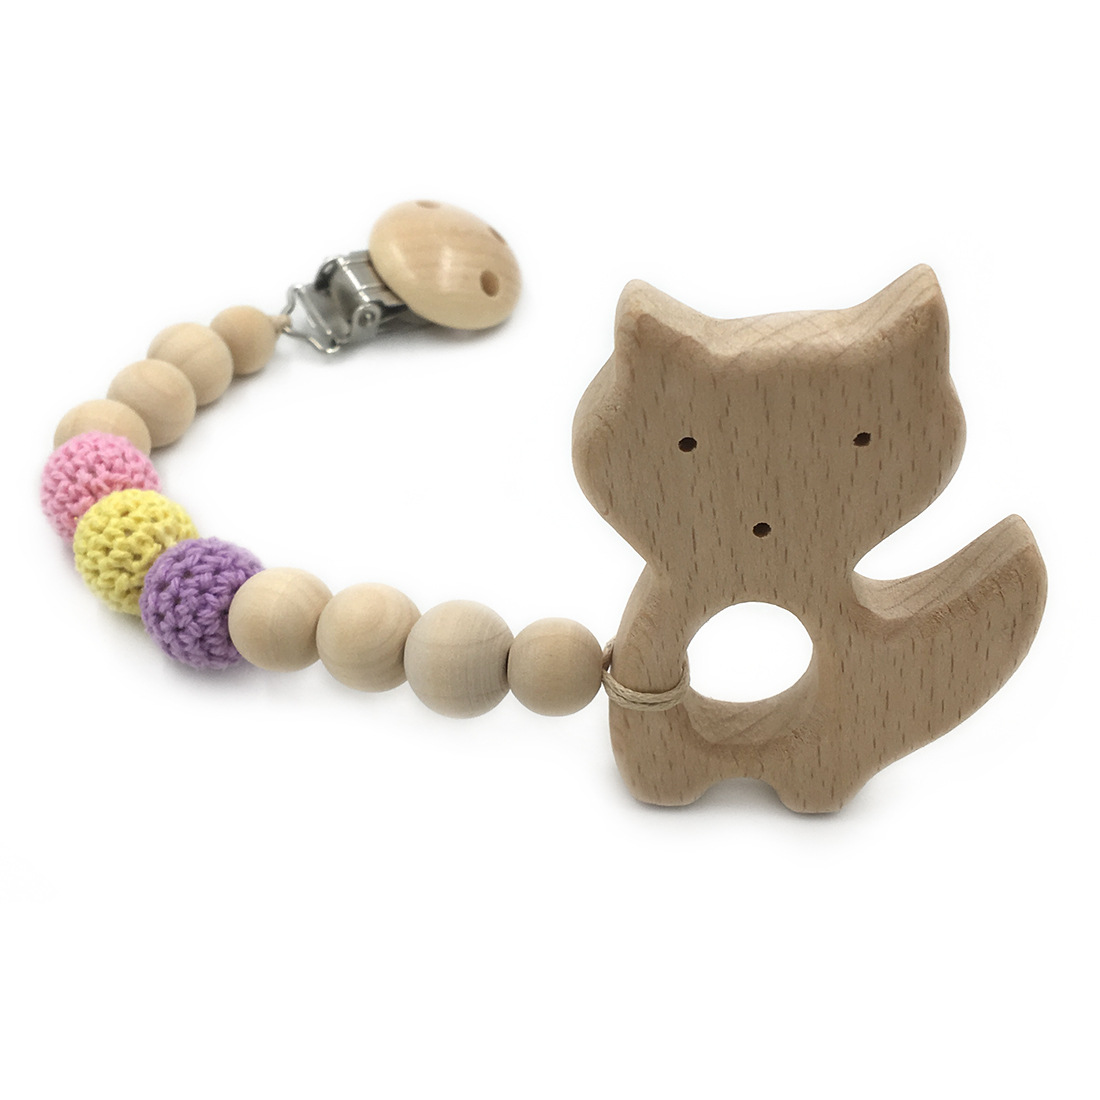 5pcs natural pacifier clip dummy holder safe wooden crochet beads shade of purple tone beech fox teether set baby boy gift box